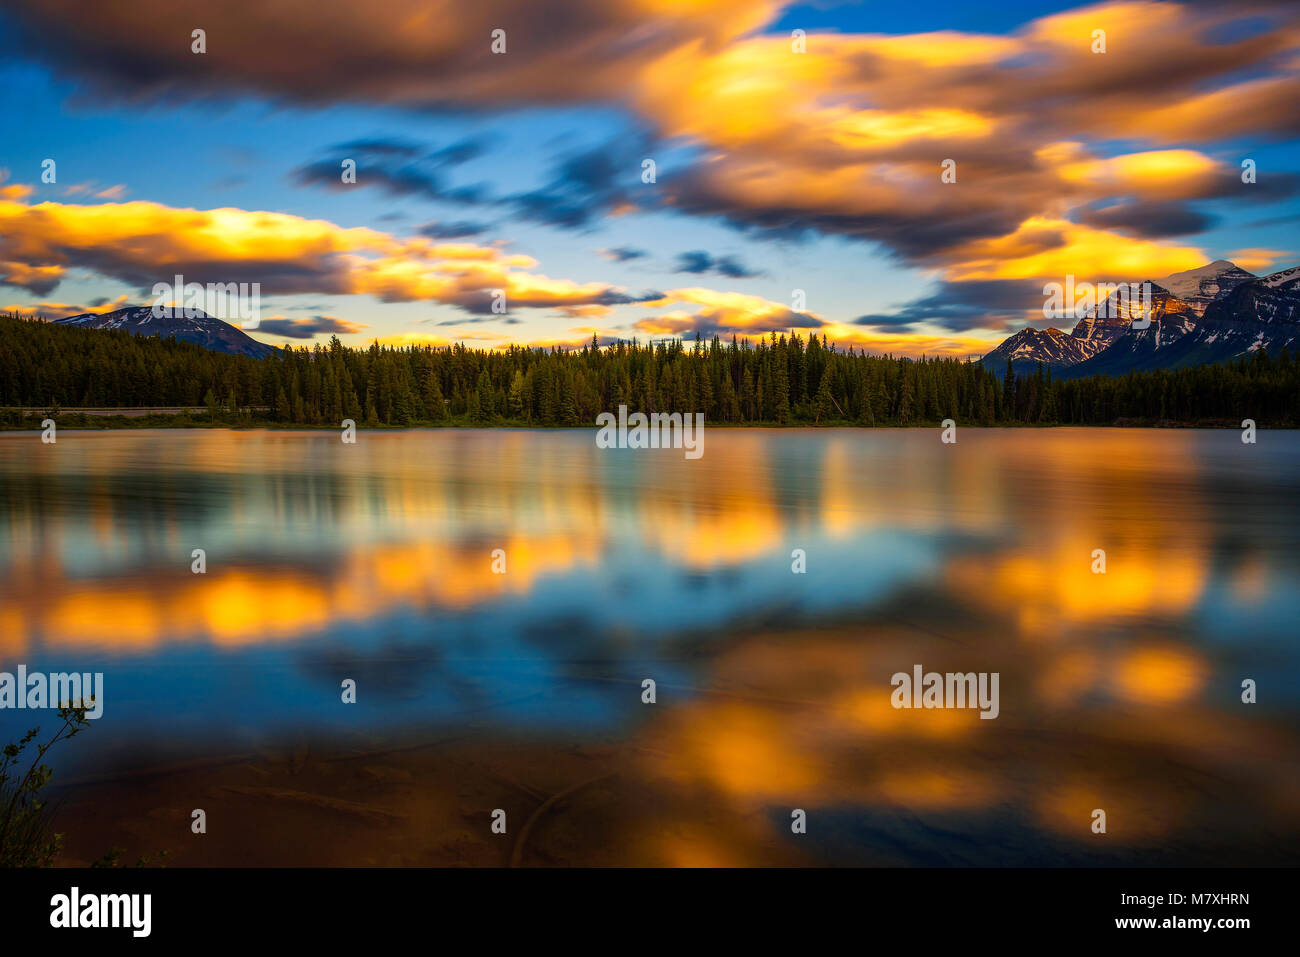 sunset-over-herbert-lake-in-banff-national-park-alberta-canada-M7XHRN.jpg